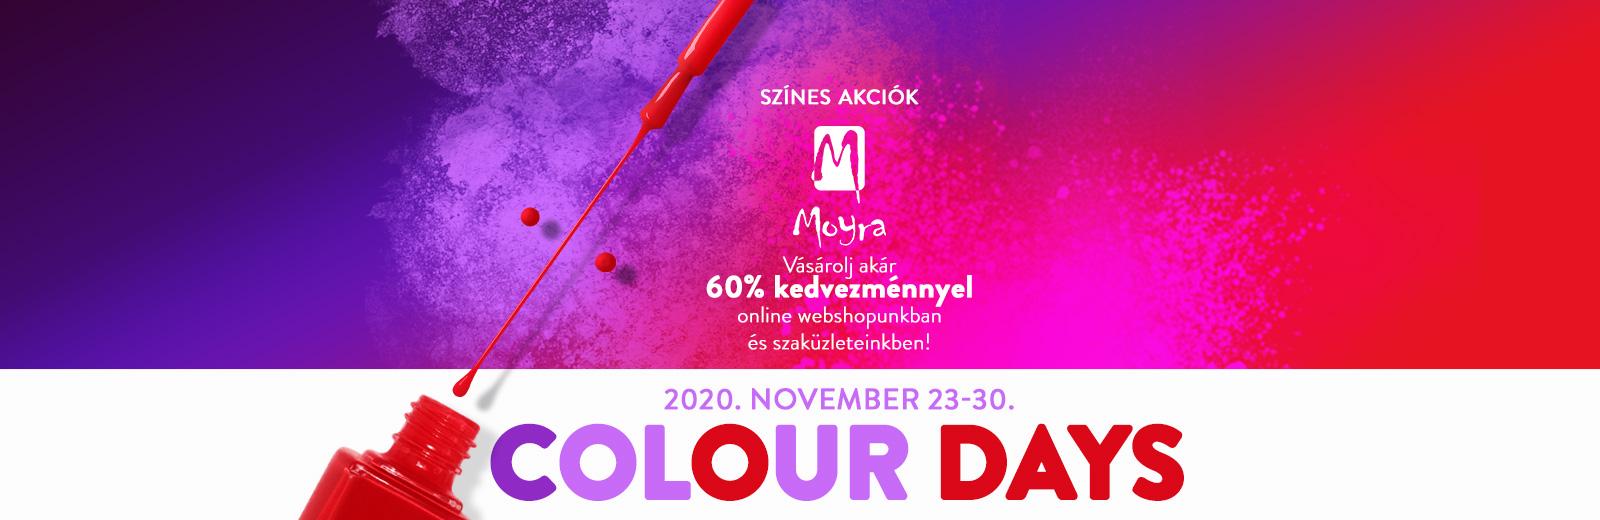 Moyra Colour Days - Színes Akciók